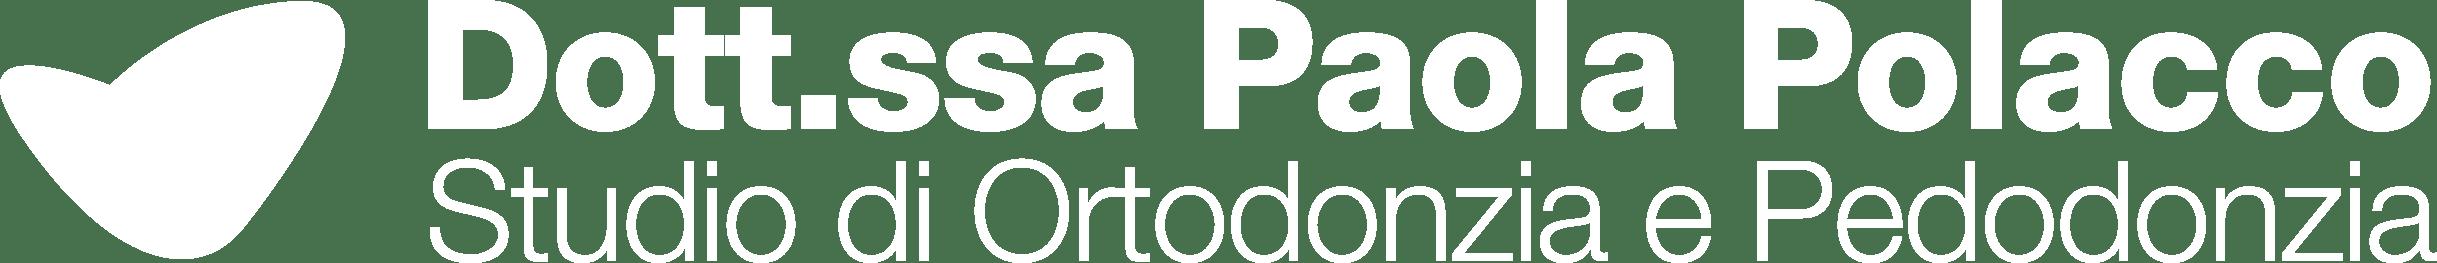 Studio Odontoiatrico e Ortodontico Paola Polacco